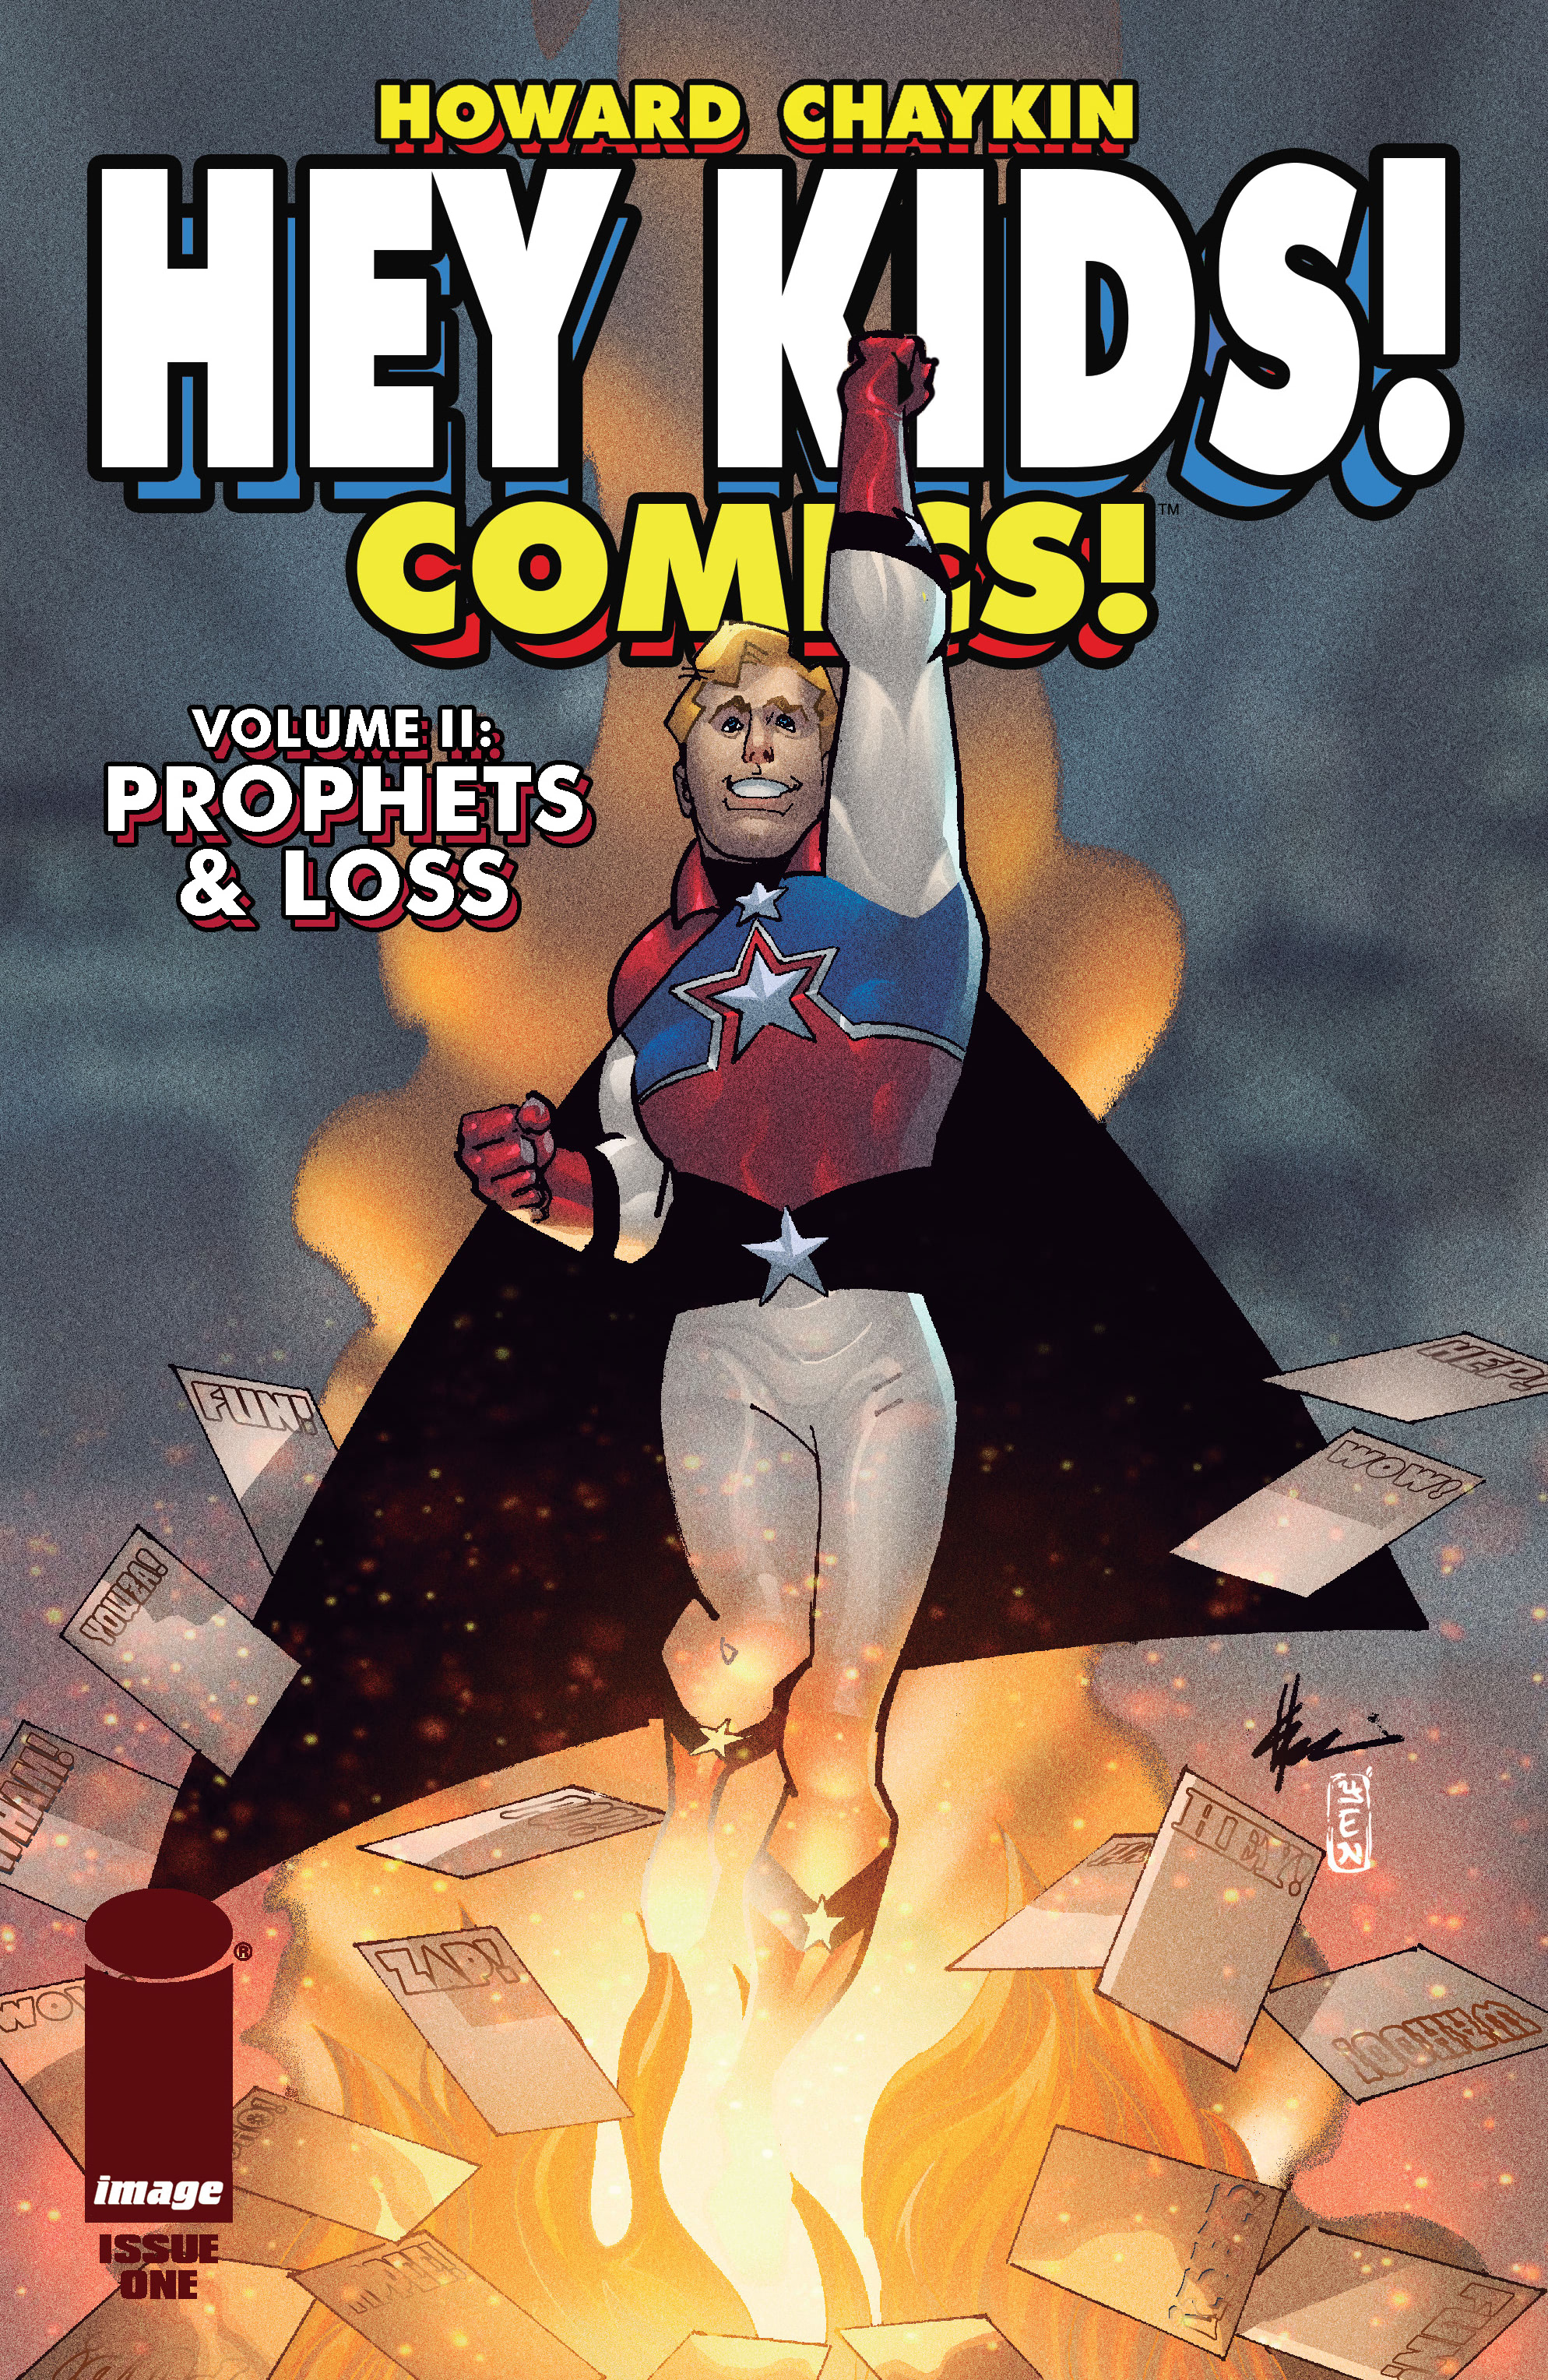 Hey Kids! Comics! Prophets & Loss